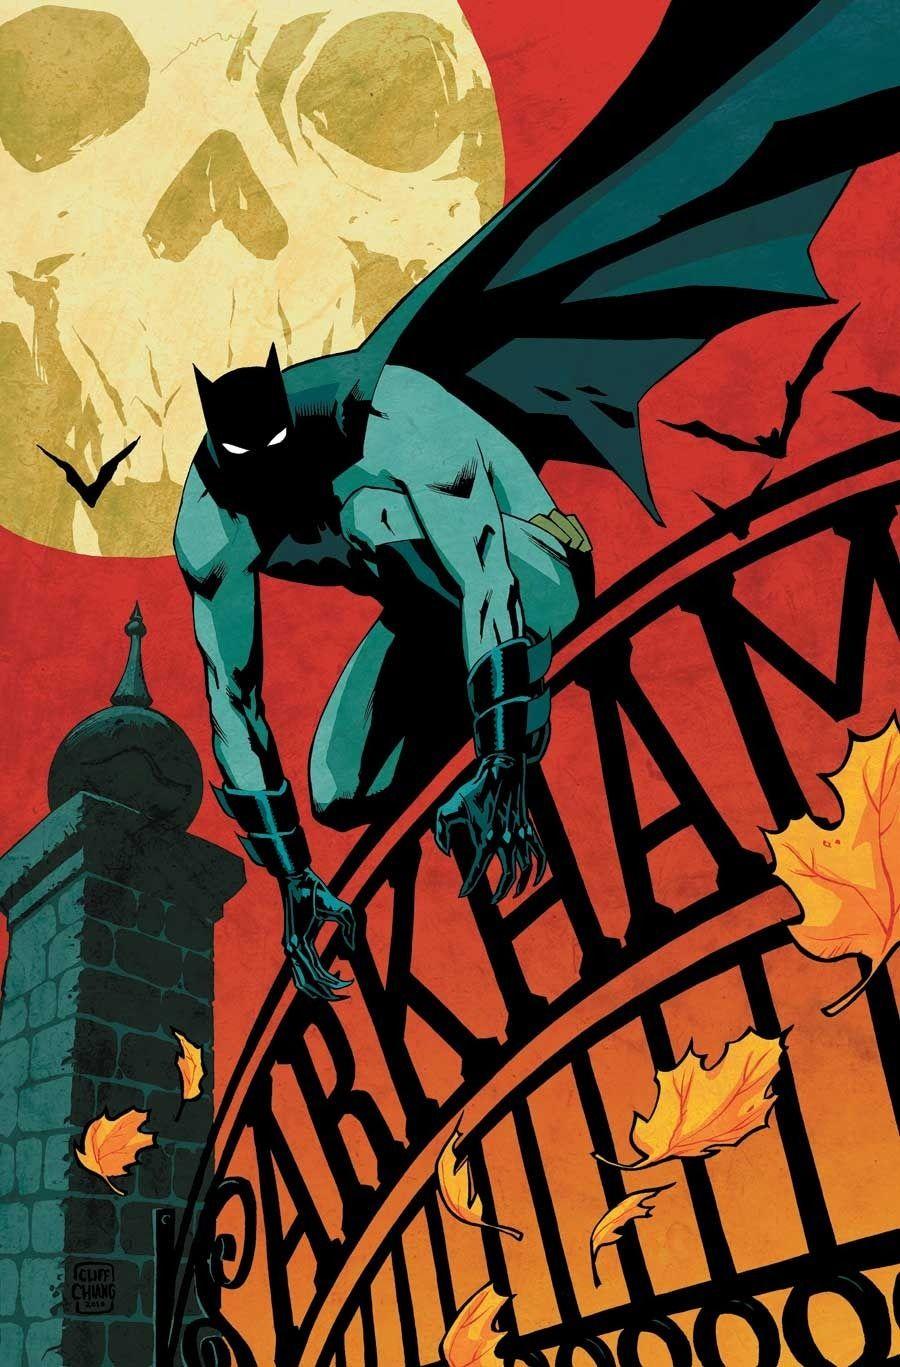 Batman by Cliff Chiang